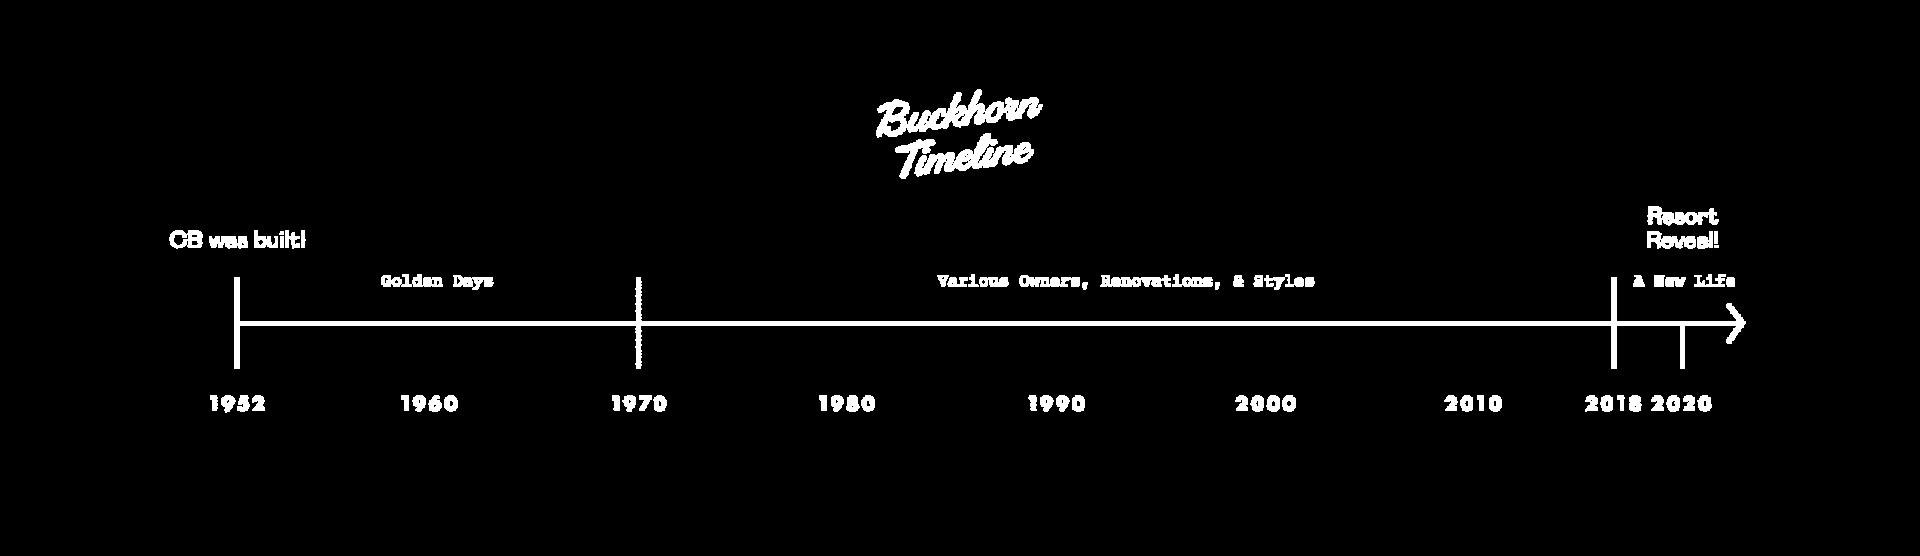 About, Cuyama Buckhorn